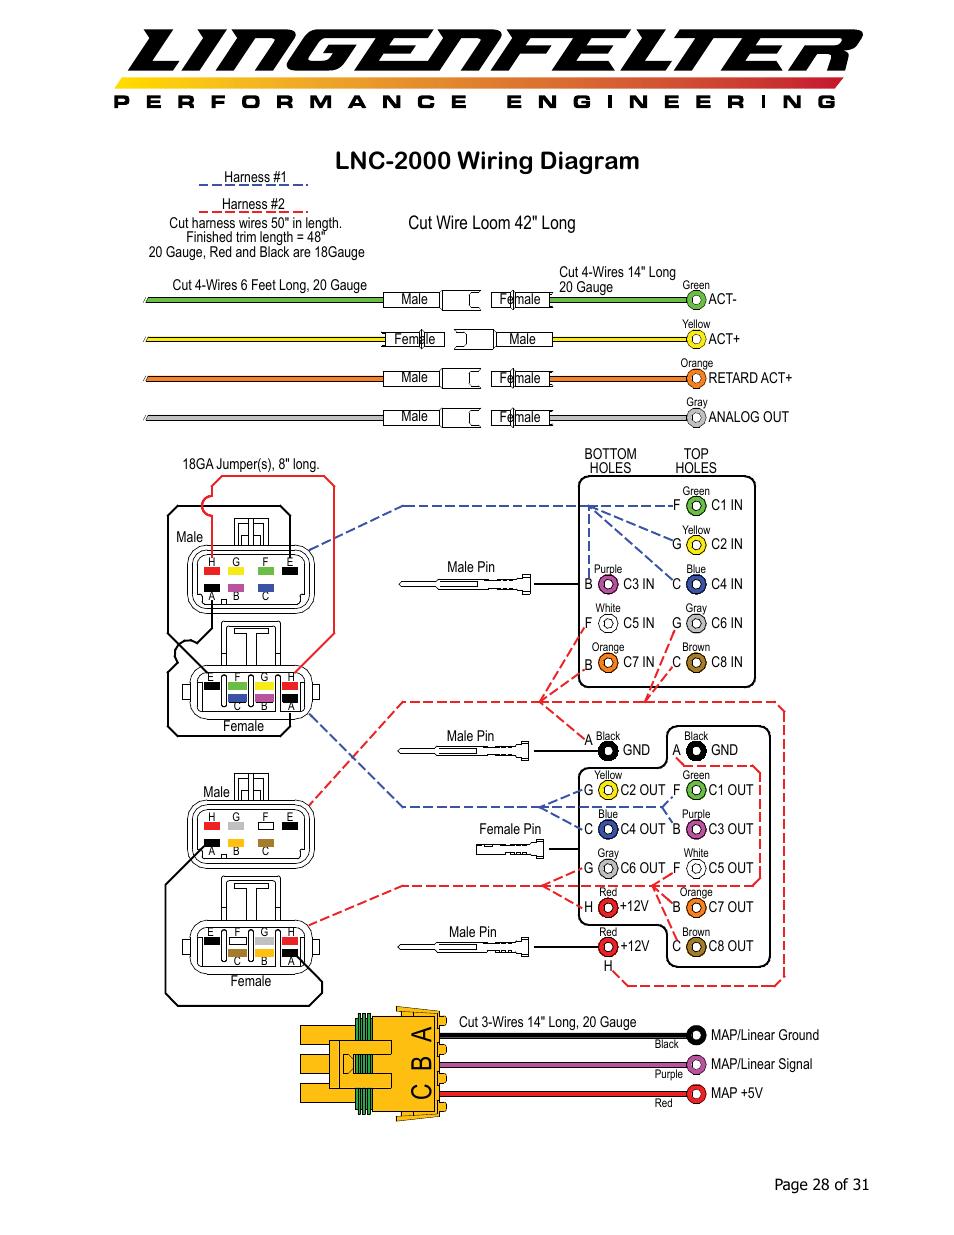 medium resolution of ab c lnc 2000 wiring diagram cut wire loom 42 long lingenfelter l460145297 lingenfelter lnc 2000 ls timing retard launch controller v2 0 user manual